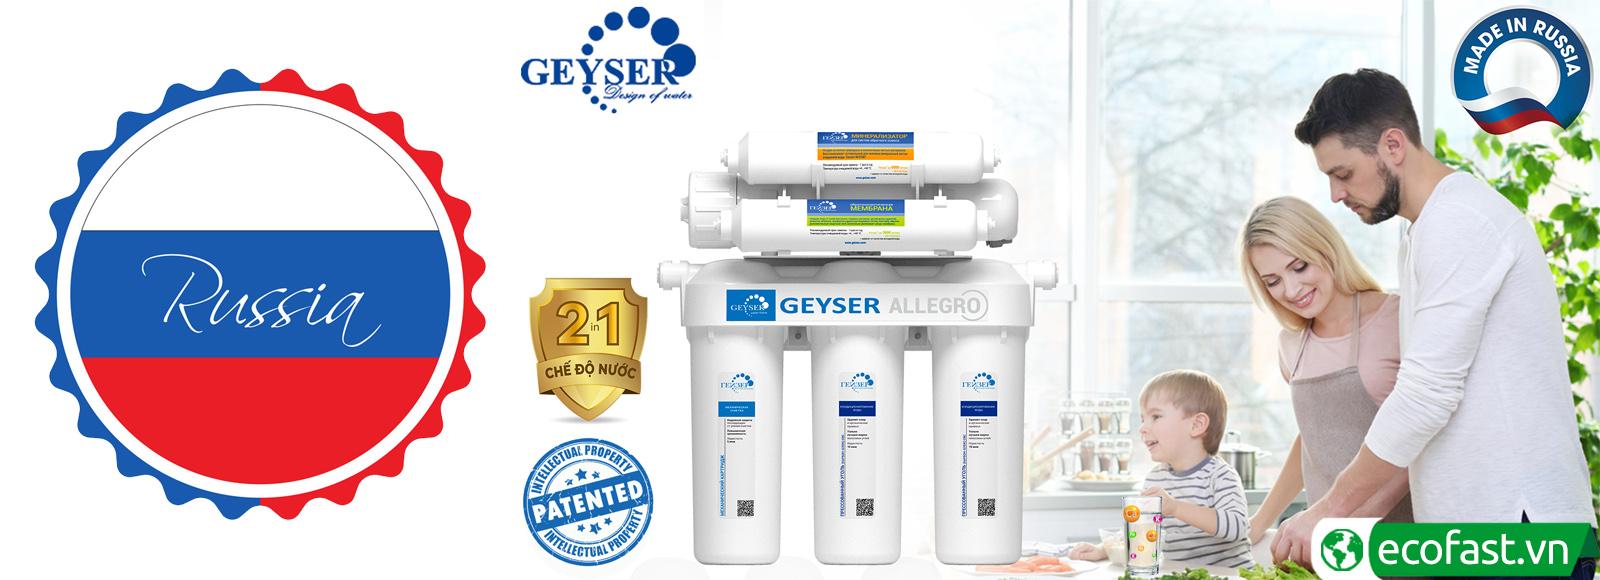 Máy lọc nước RO Geyser